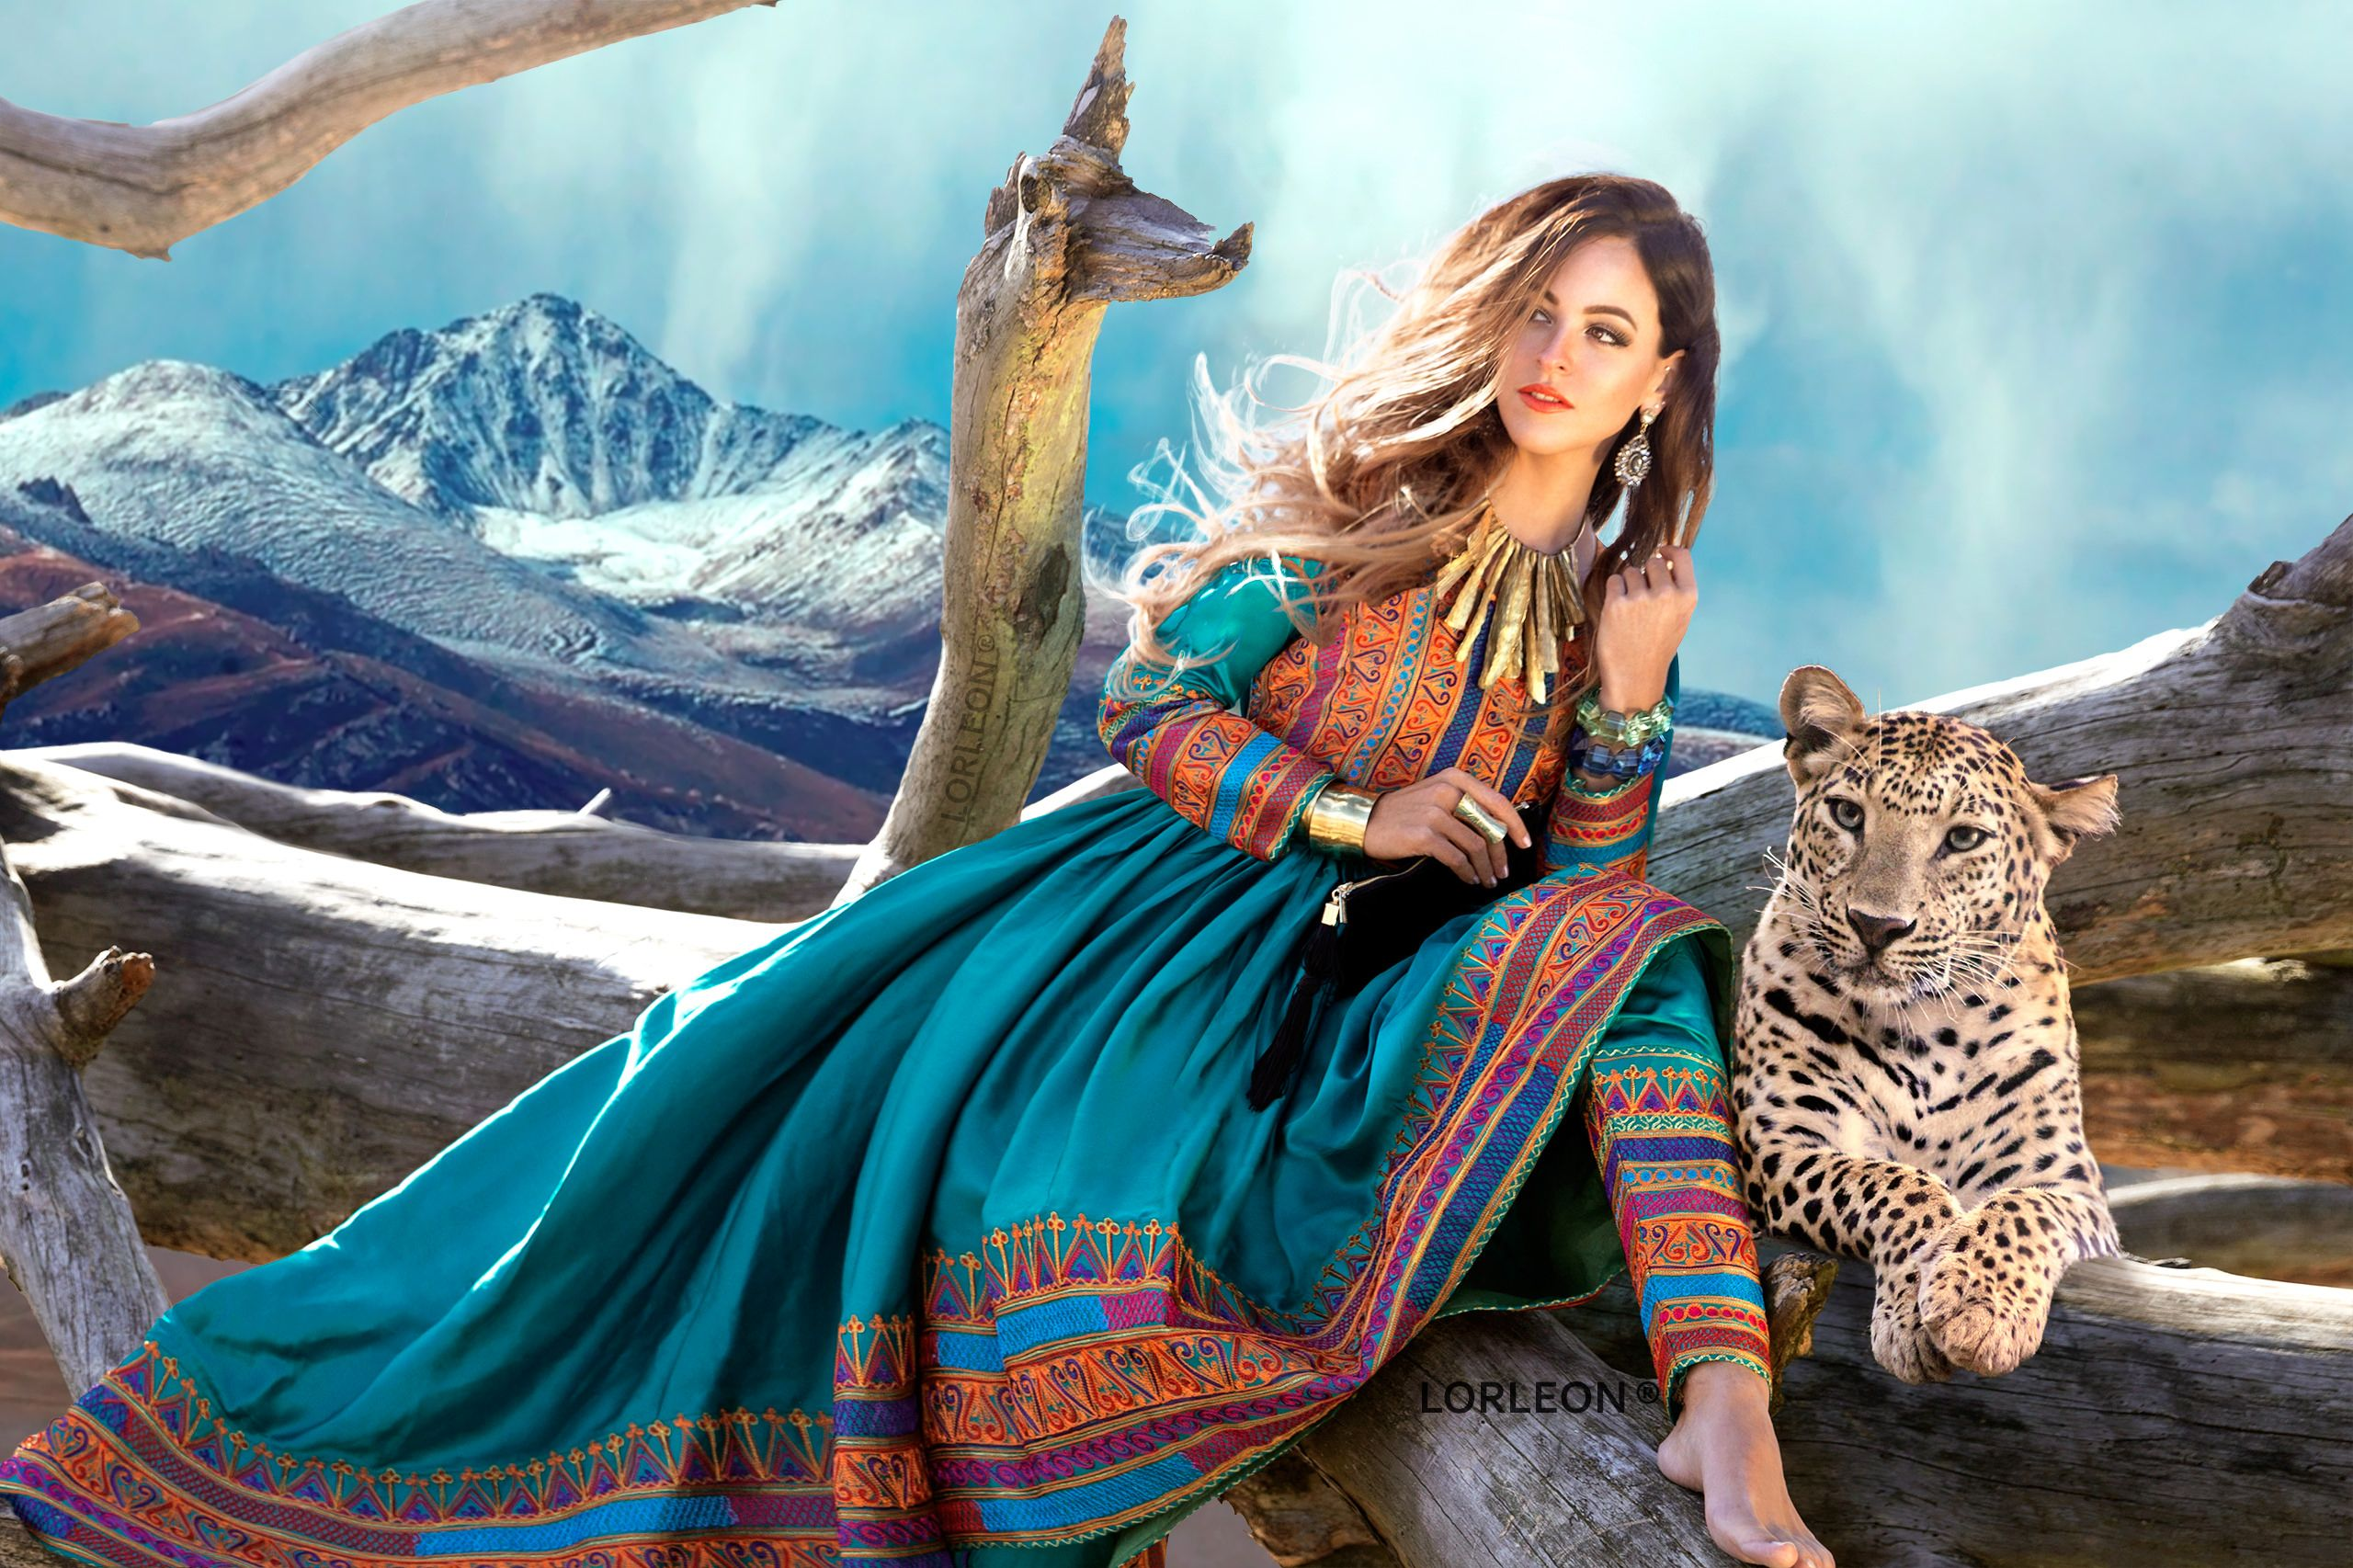 #hosnakohestani #afghan #afghanclothes #kuchi #designer #afghandress #parisfashionweek #afghandesigner #afghanistan #kabul #afghani #newkuchidress #bohemian #tribal #gypsy #afghandress2016